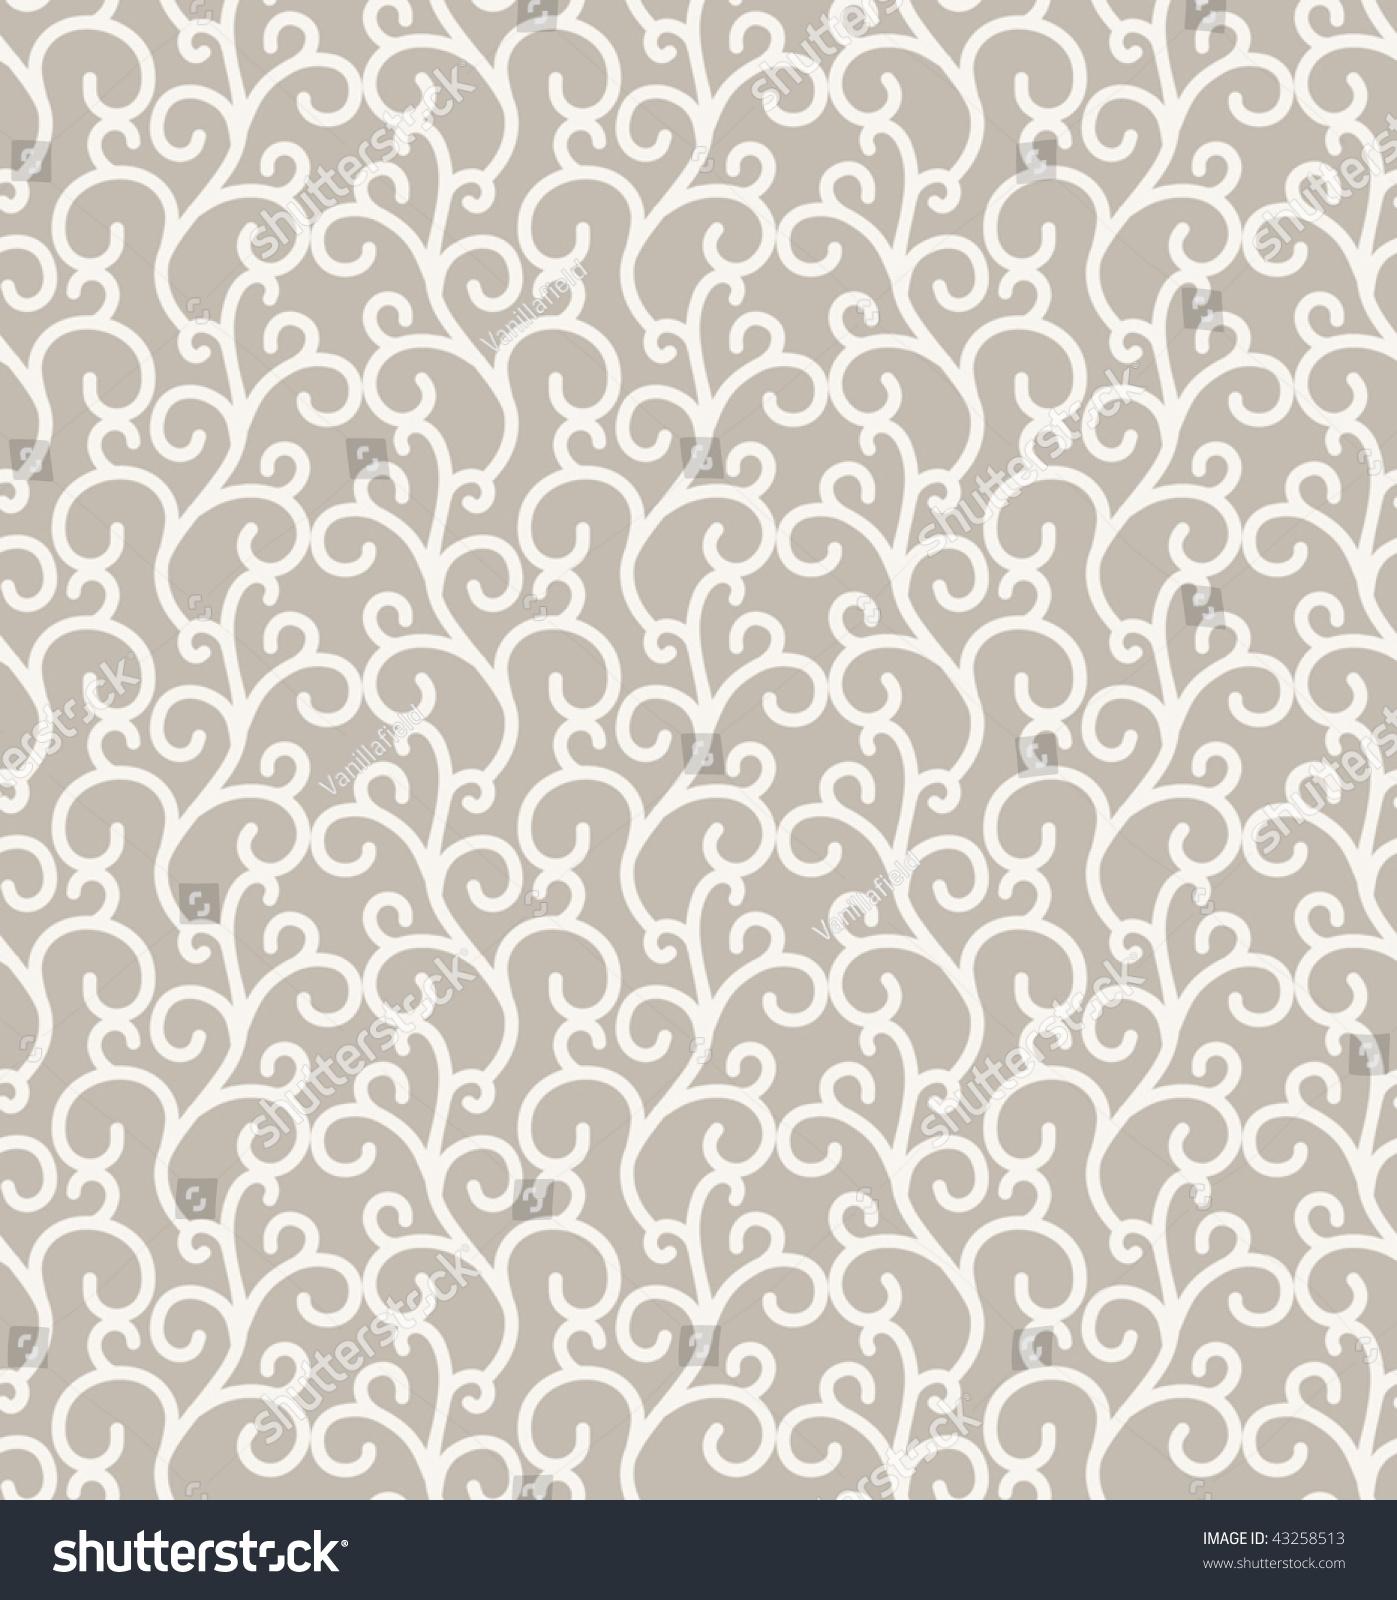 Elegant curl pattern in neutral colors stock vector for Elegant neutral paint colors